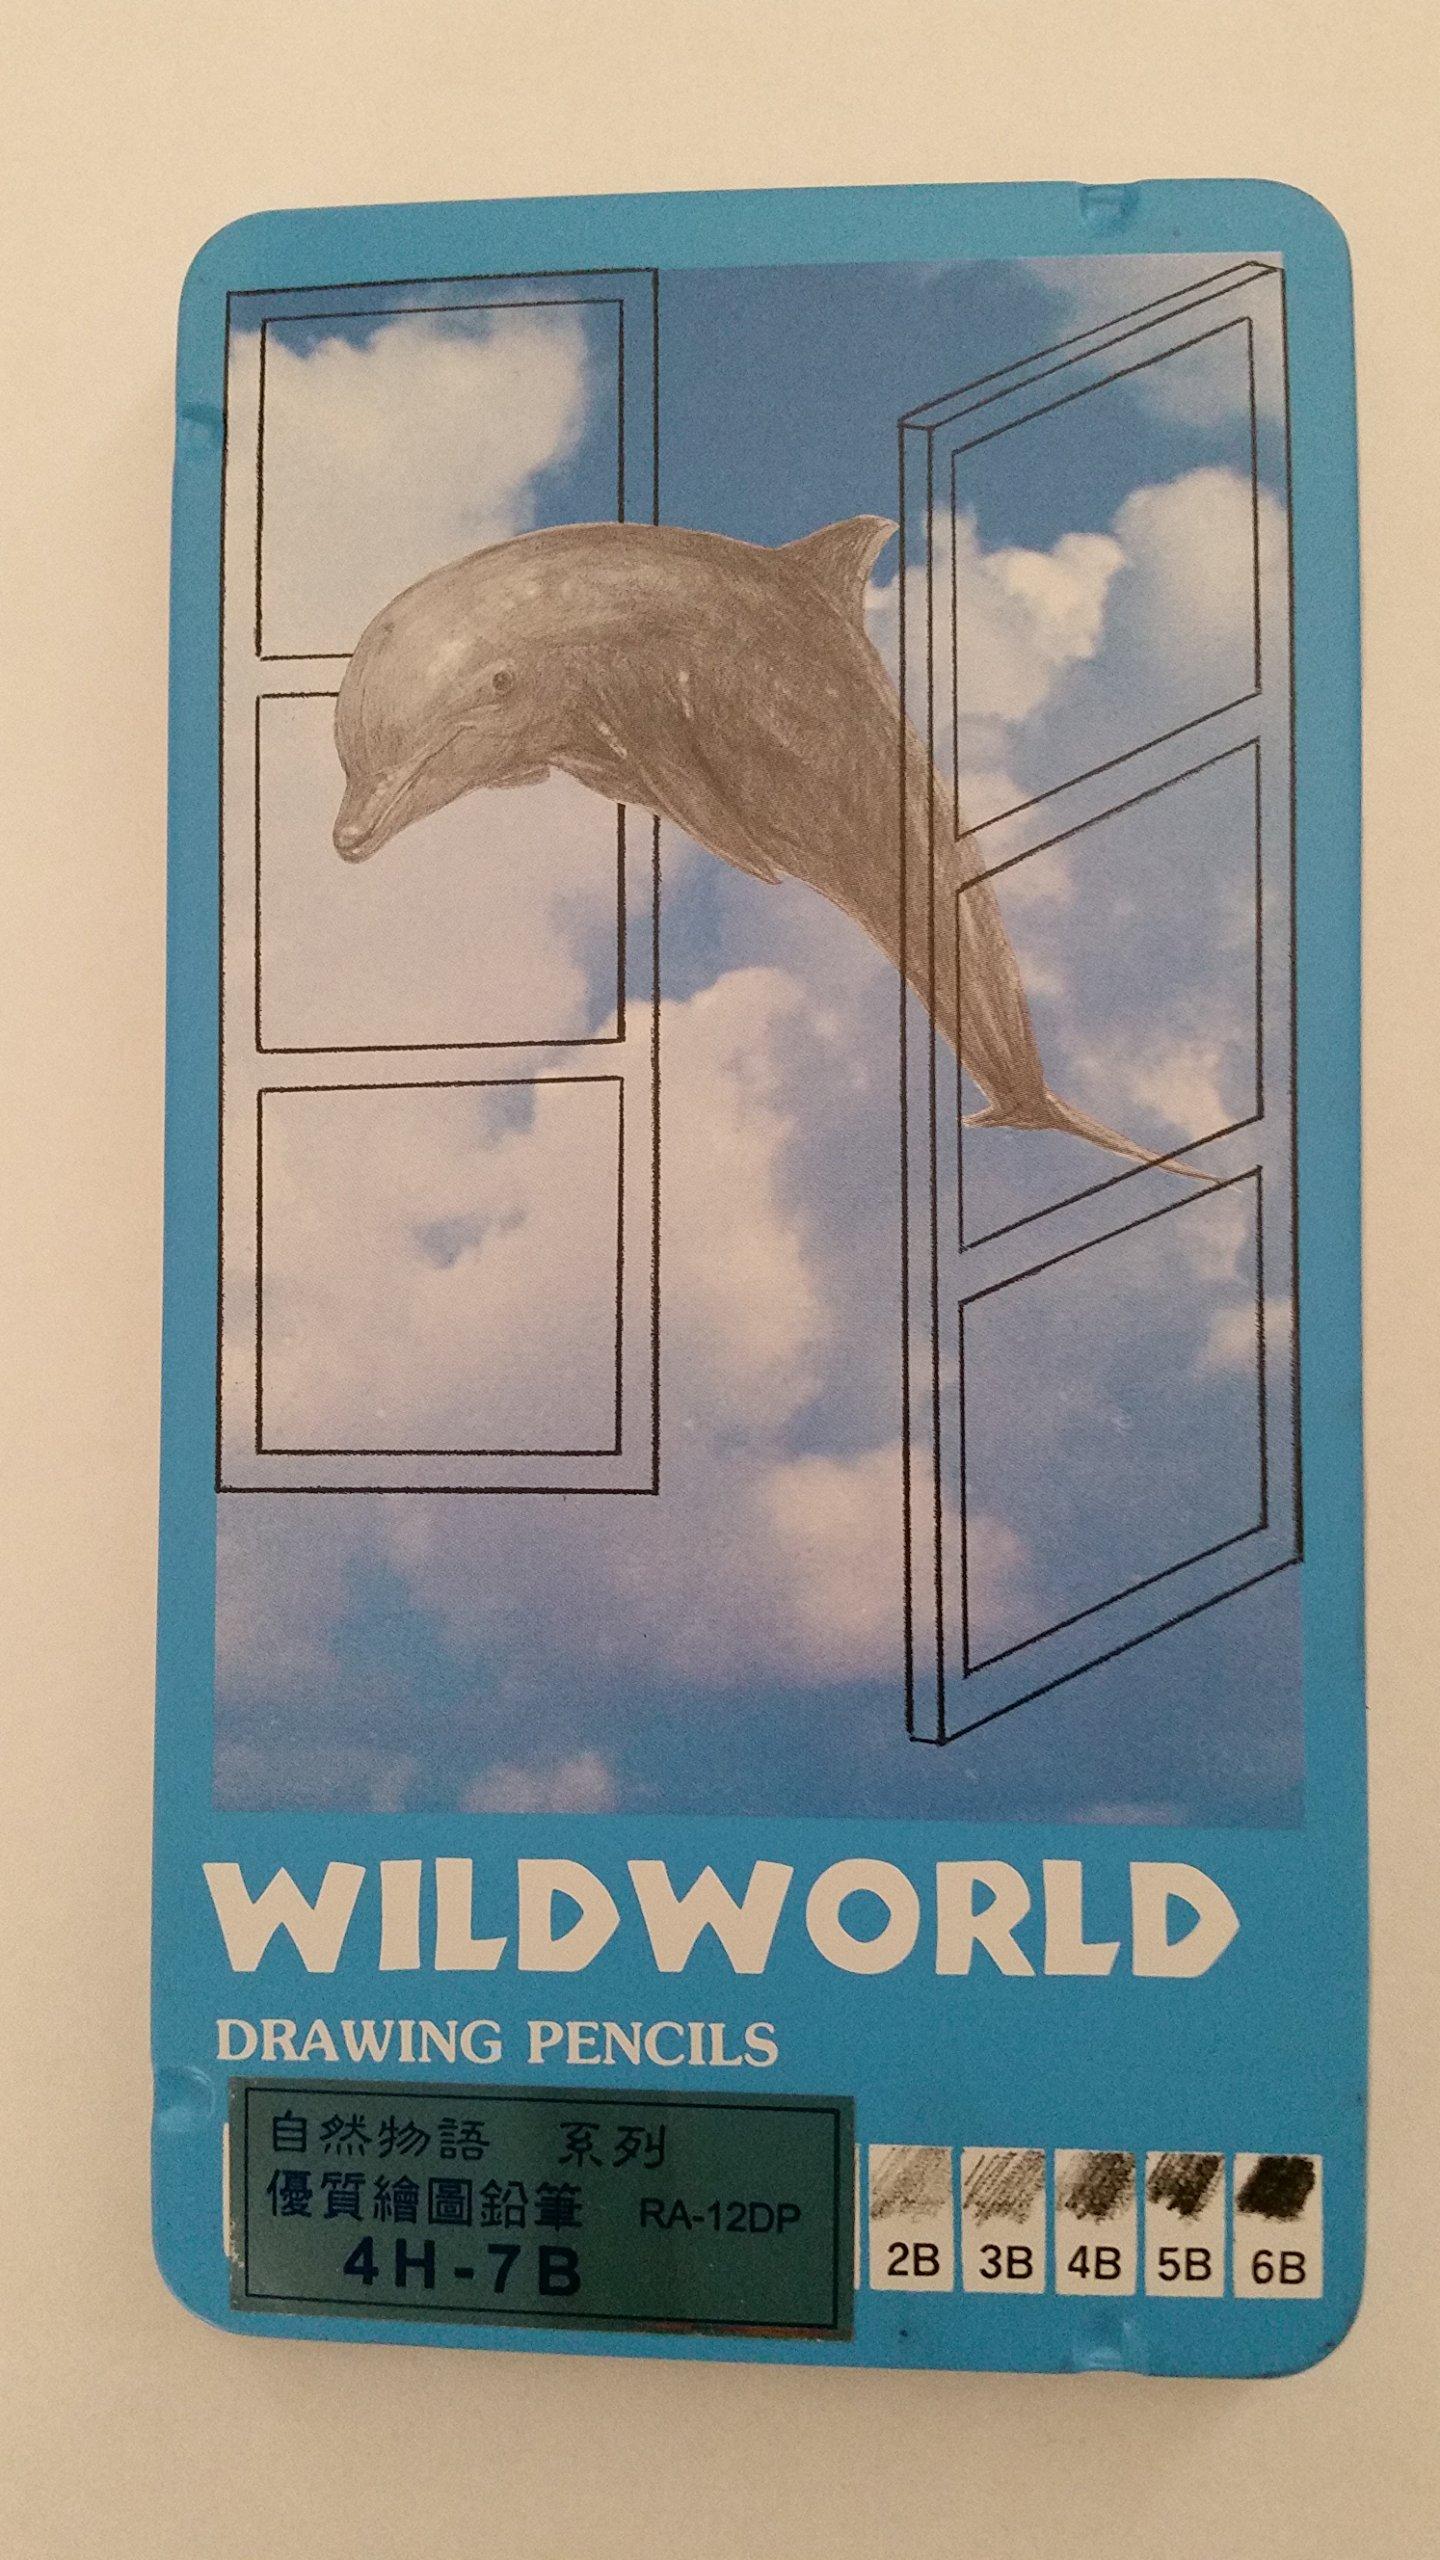 Wildworld Drawing Pencil 4H-7B